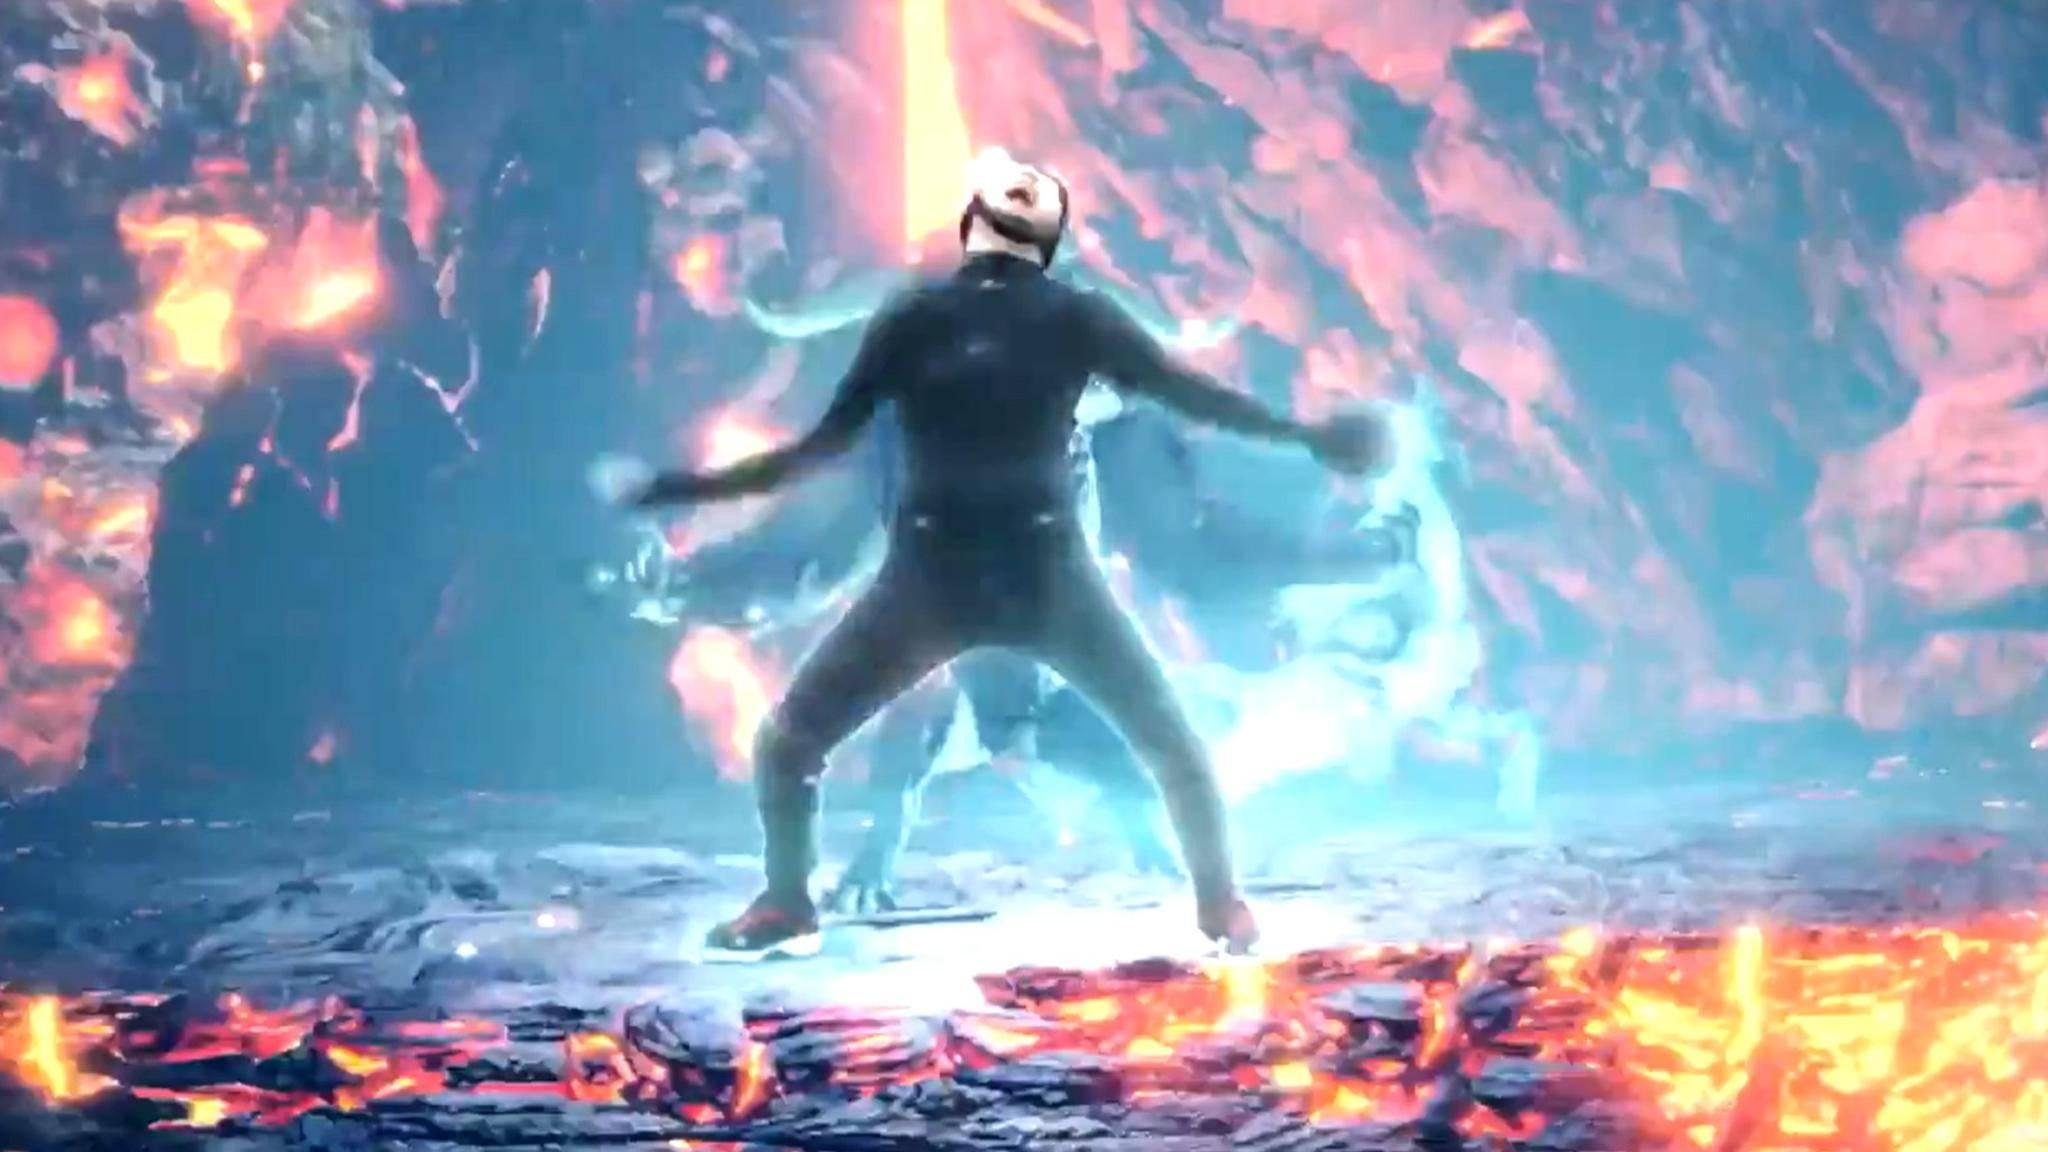 monster-hunter-world-iceborne-motion-capturing-video-screenshot